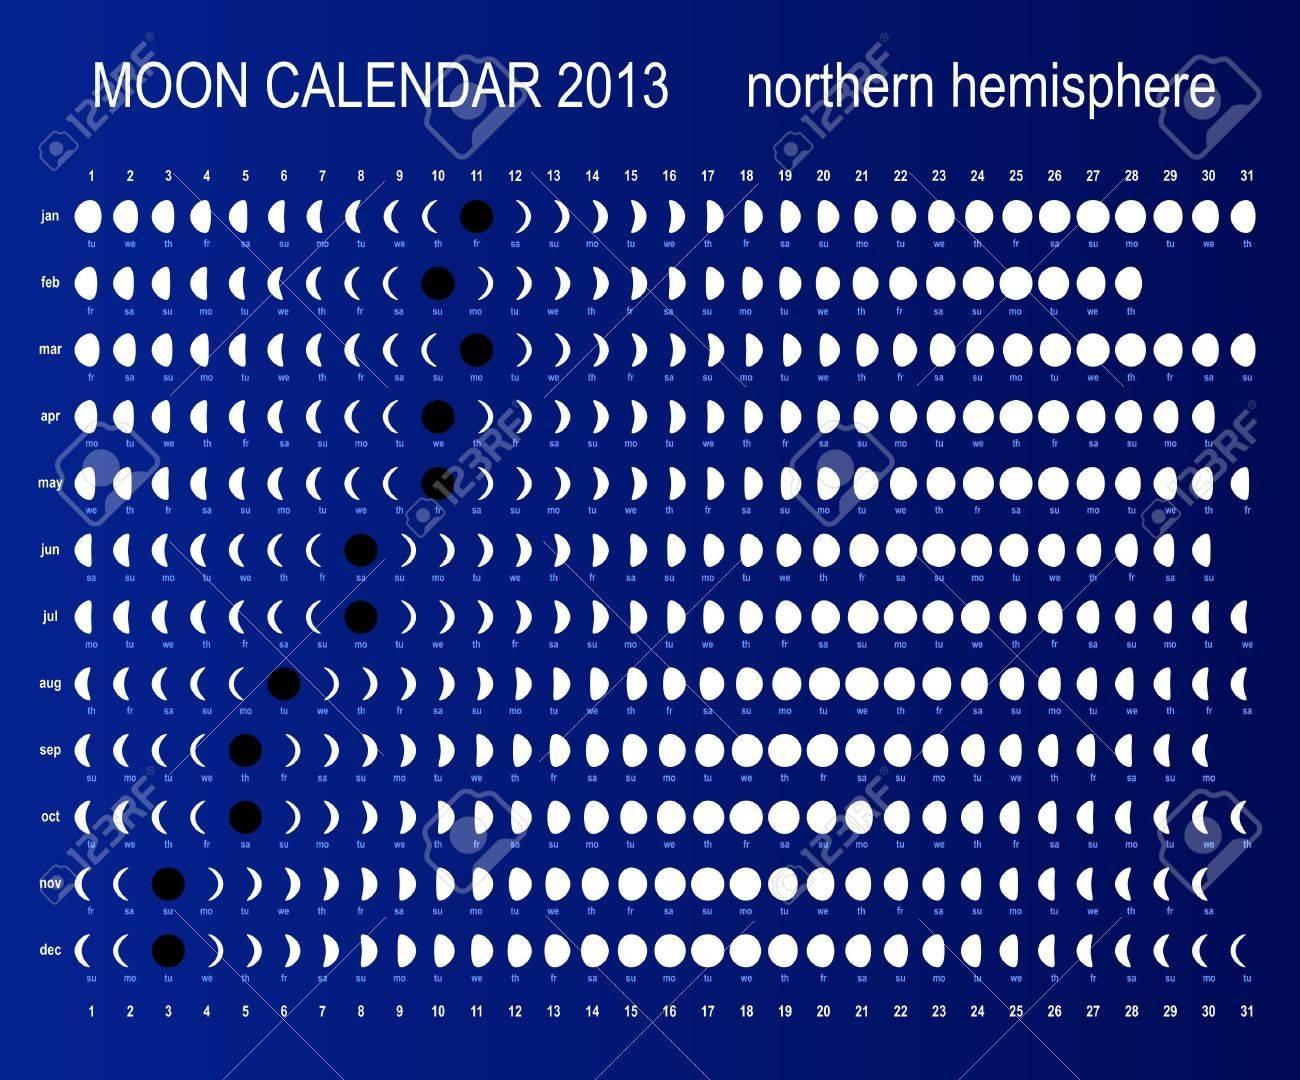 Moon calendar for northern hemisphere Stock Vector - 13705312